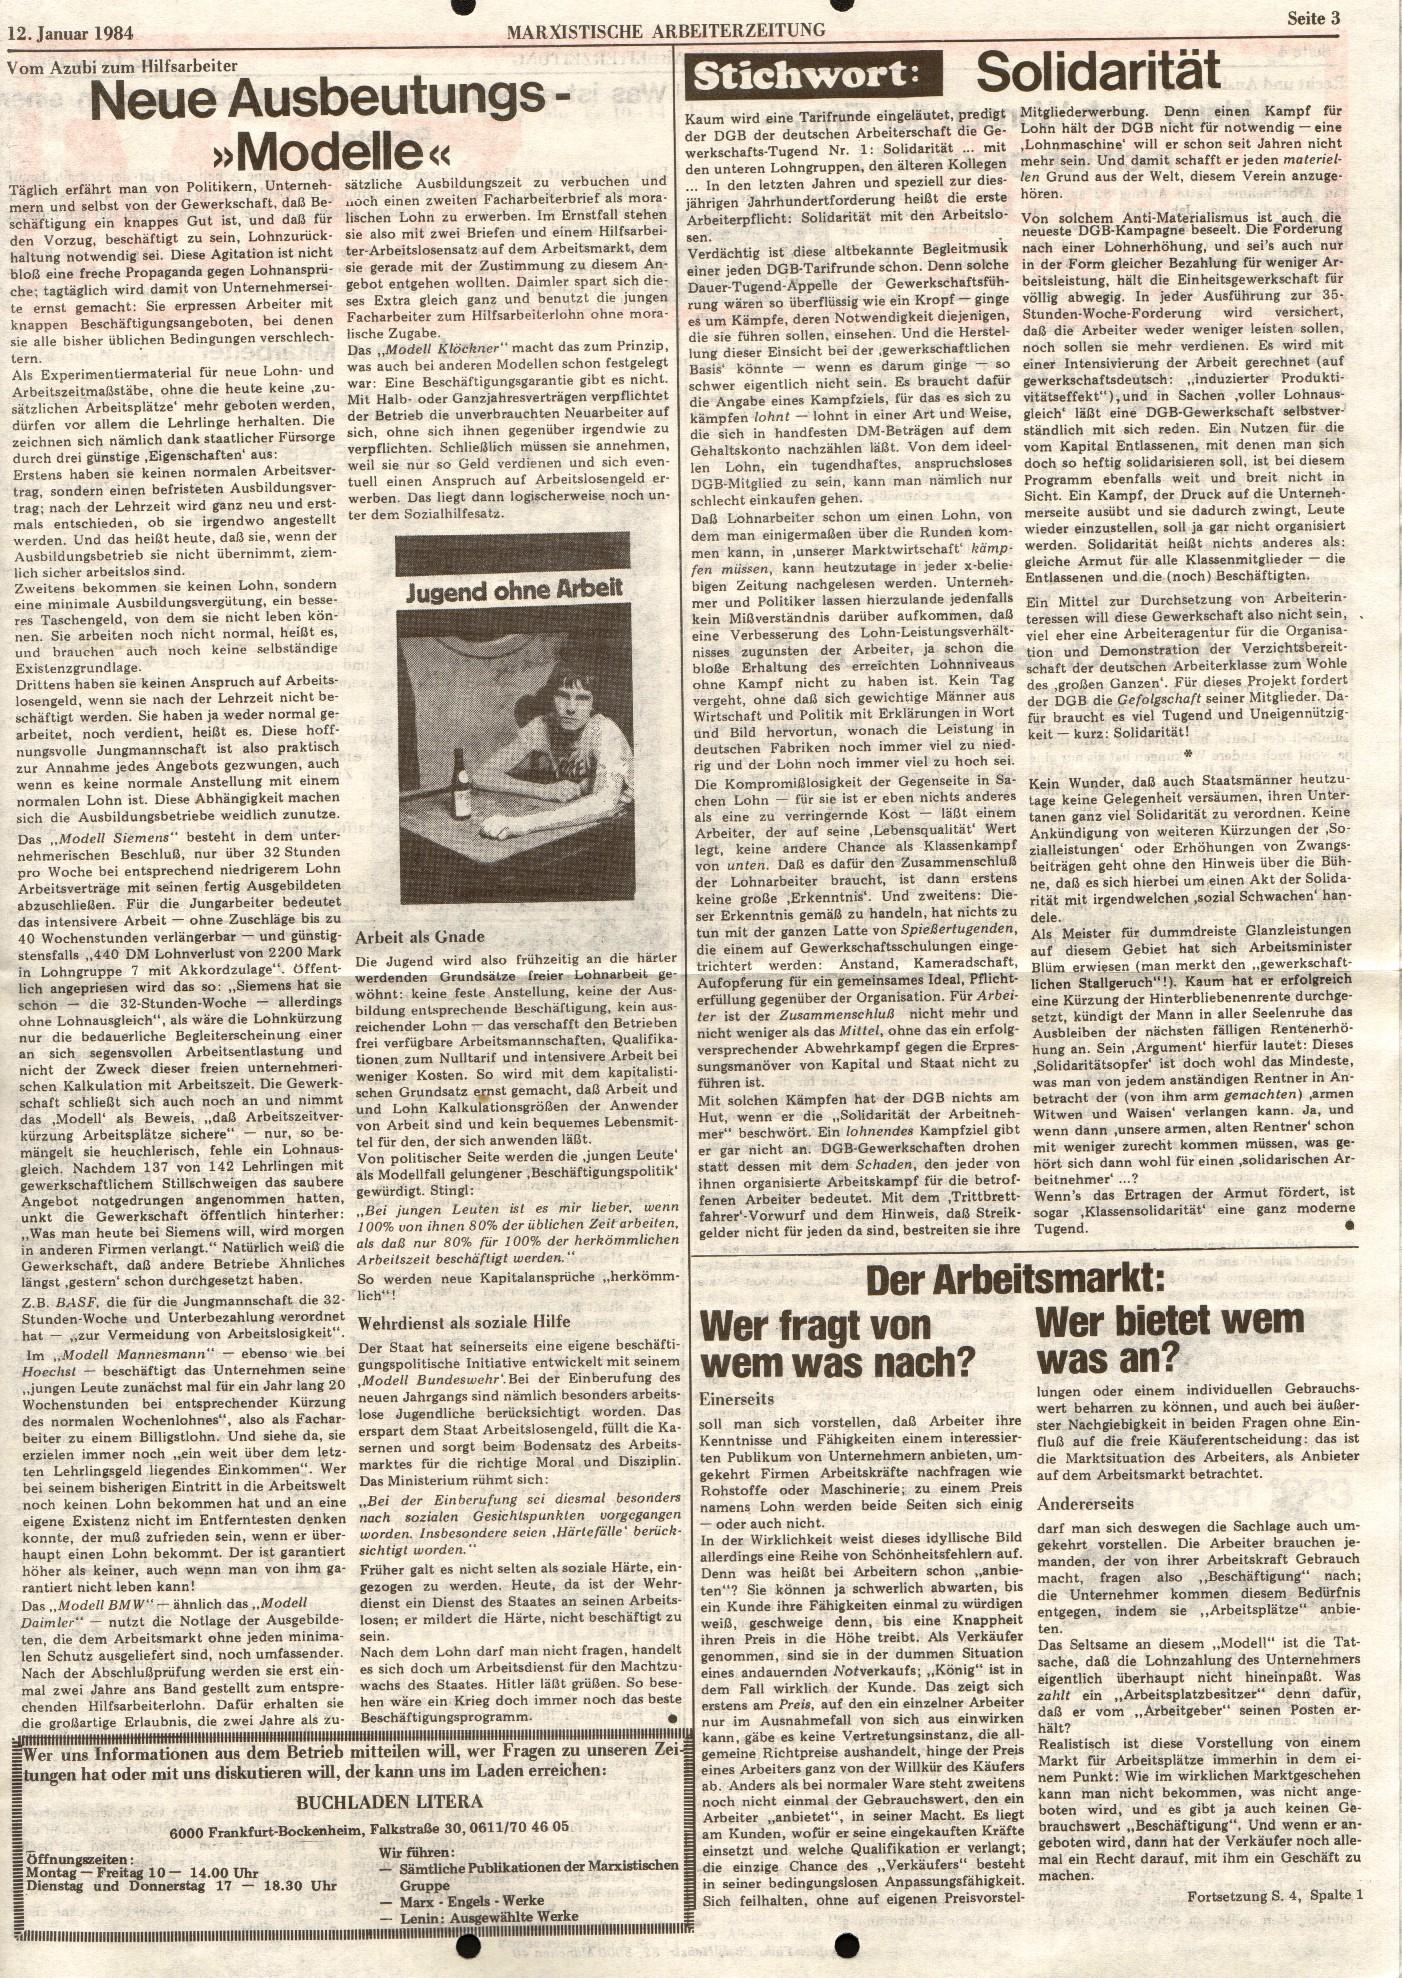 Ruesselsheim_MG_Marxistische_Arbeiterzeitung_Opel_19830112_03